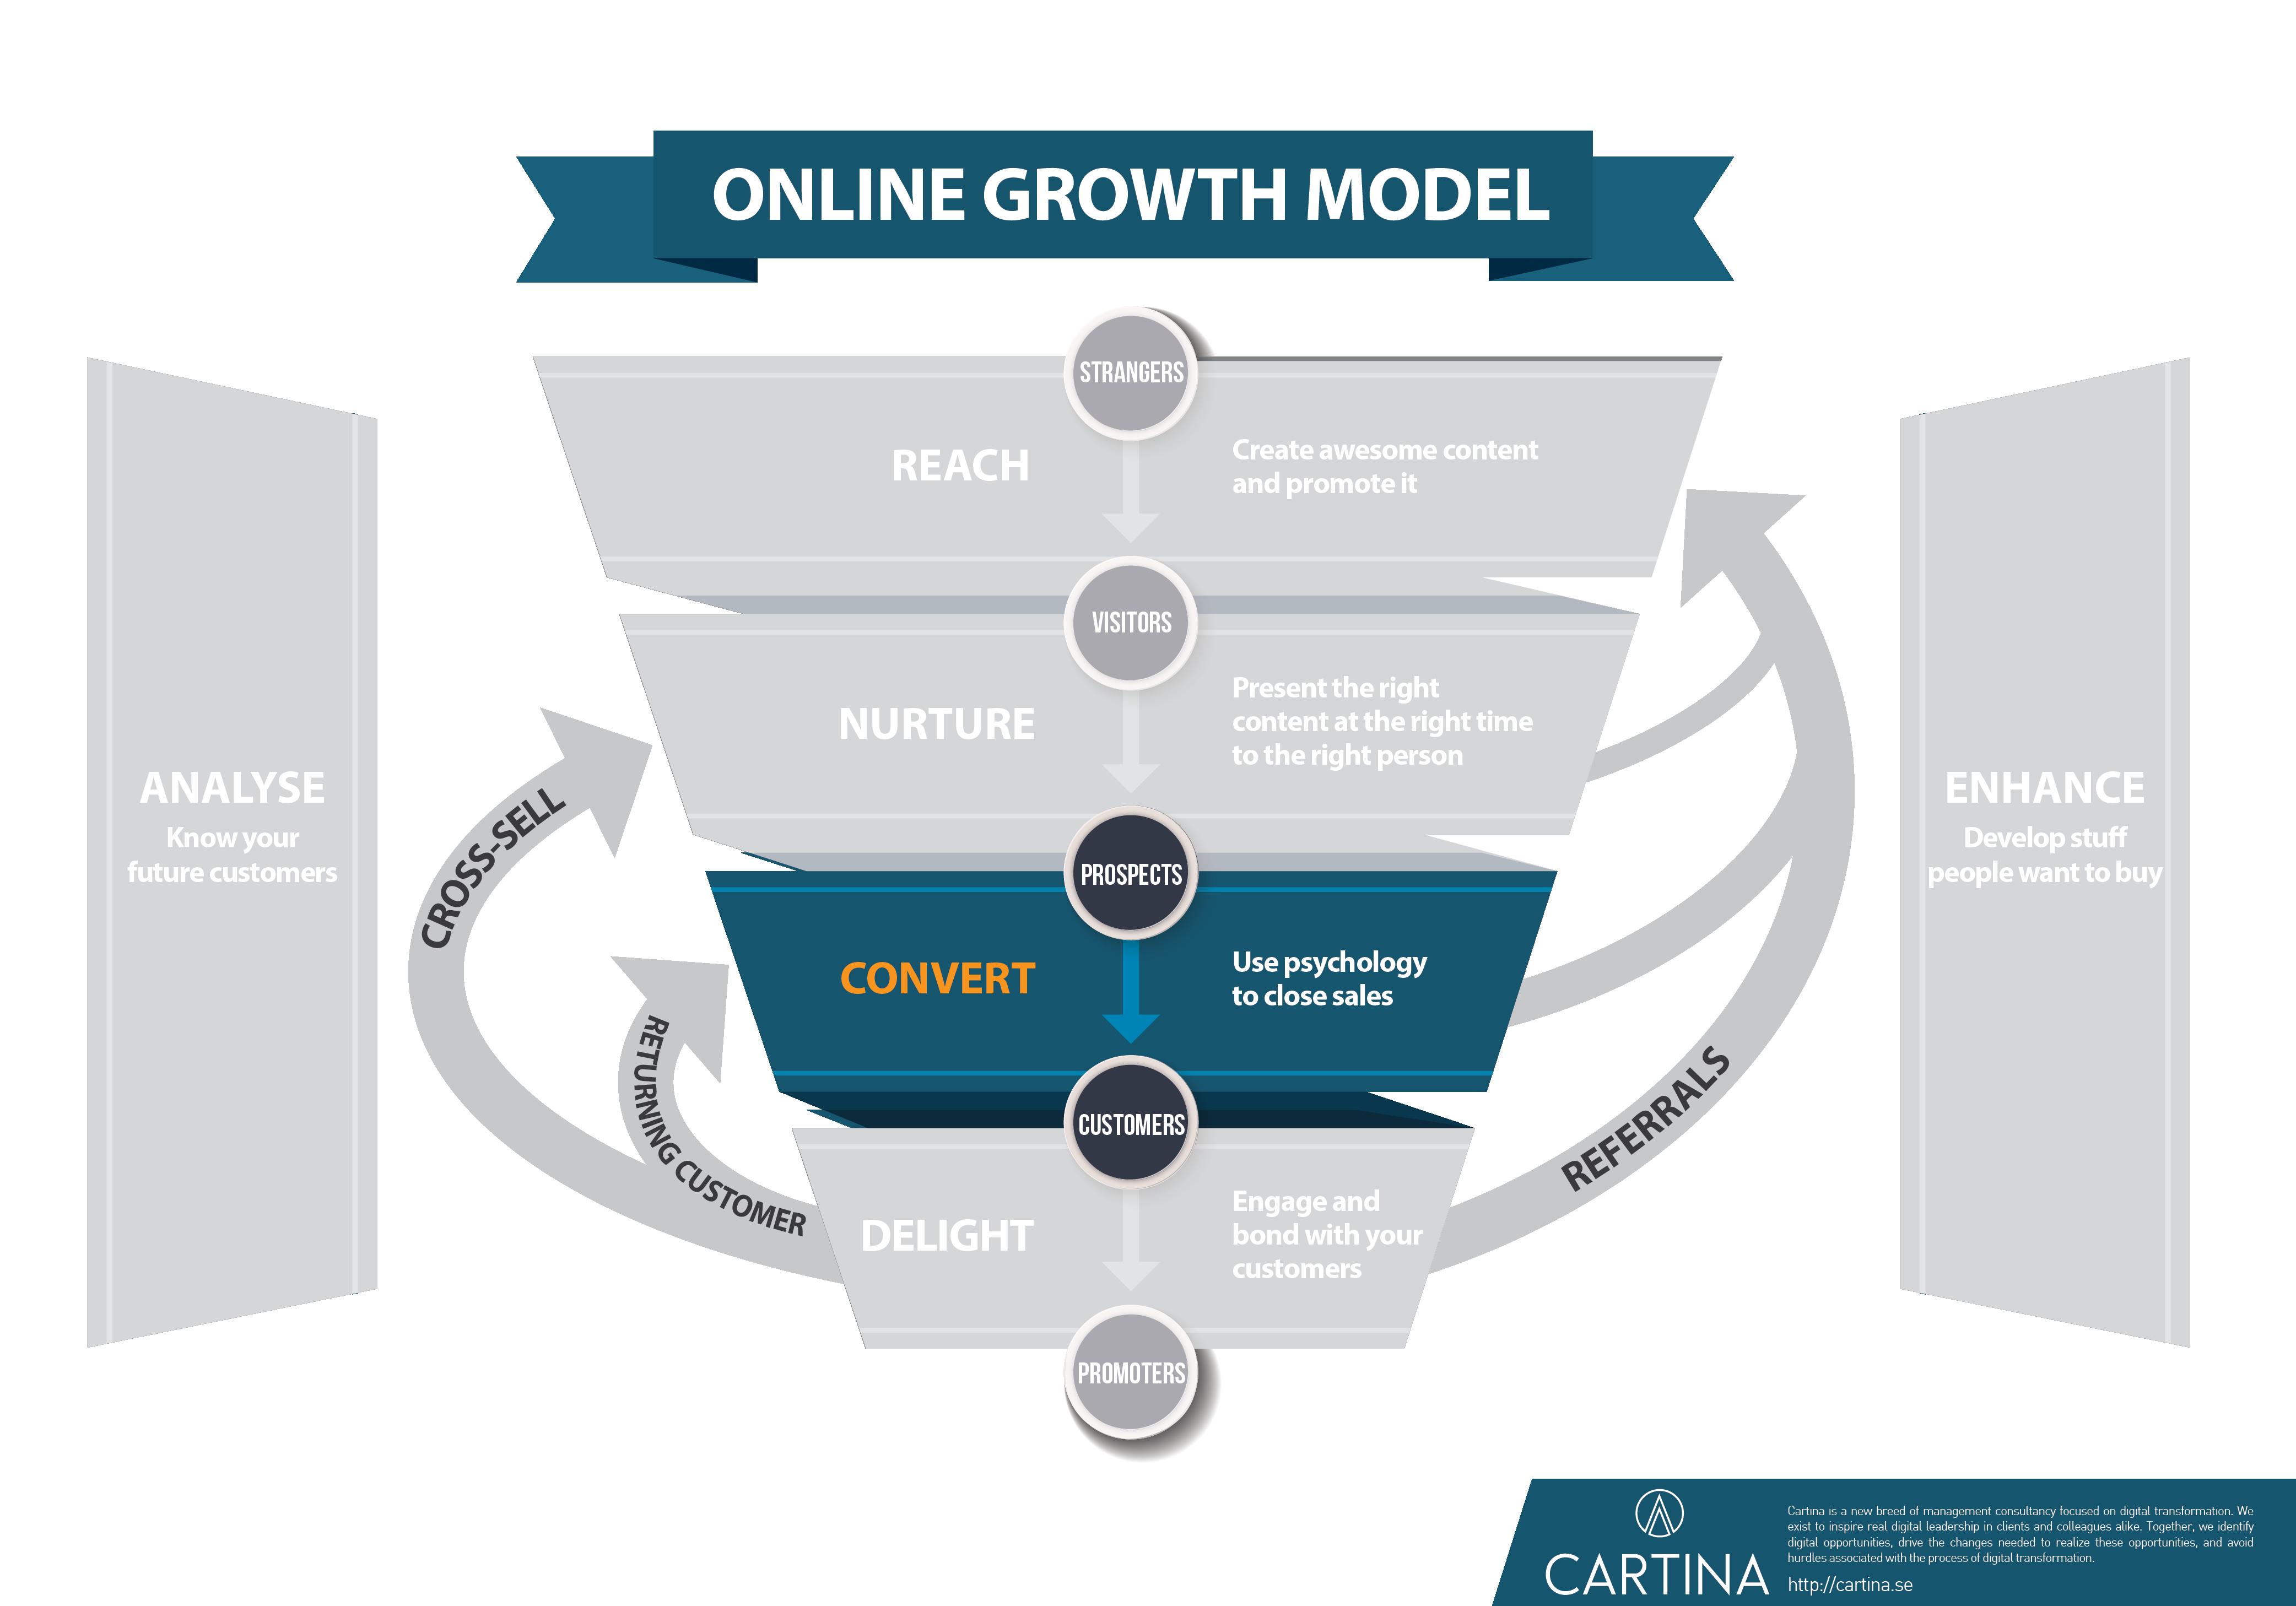 Growth model - Convert step